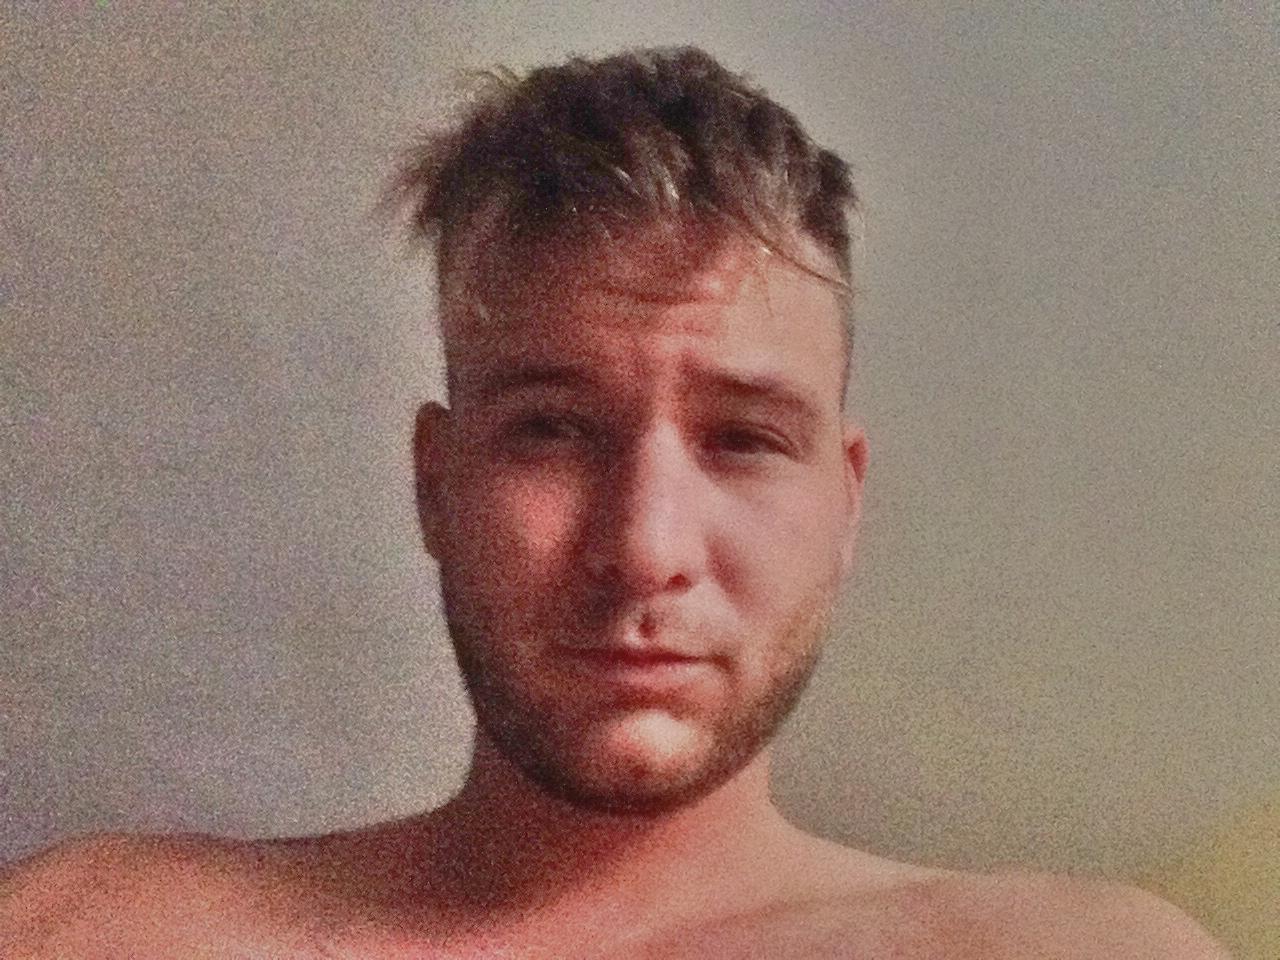 Istenes Bence egy napja 12 selfie-ben